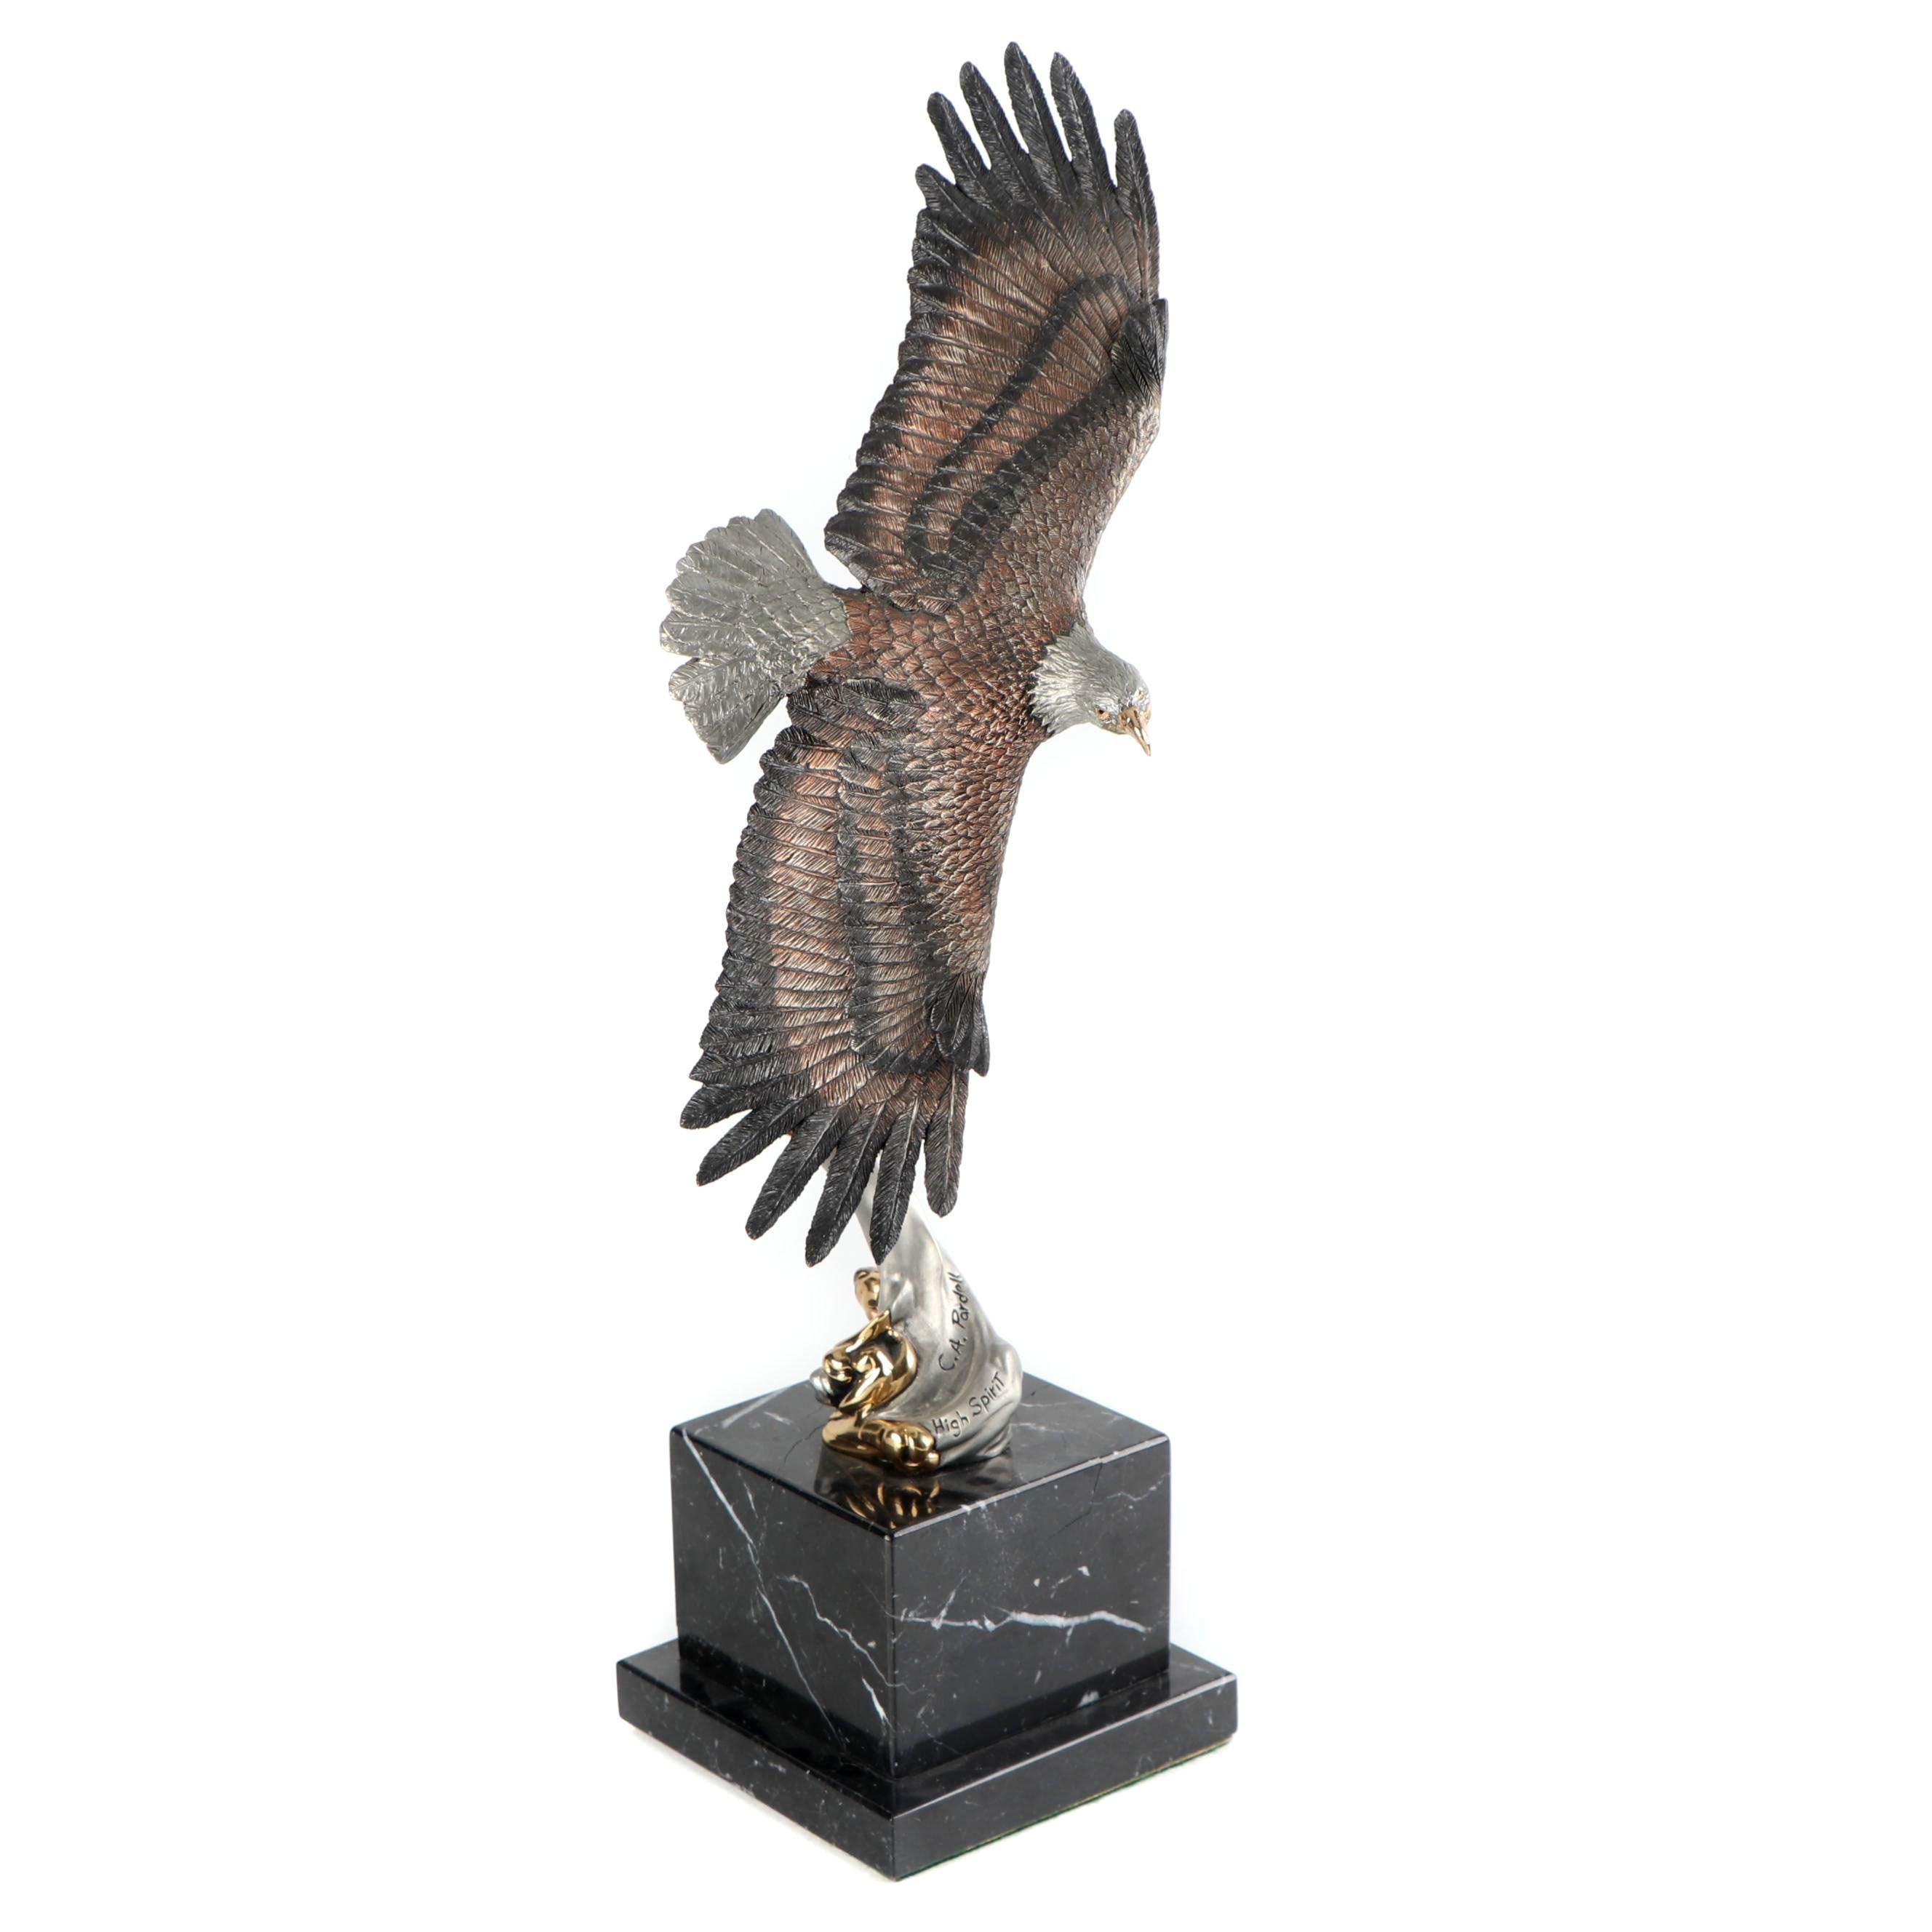 C. A. Pardell 'High Spirit' Eagle Limited Legends Pewter Sculpture, 1989